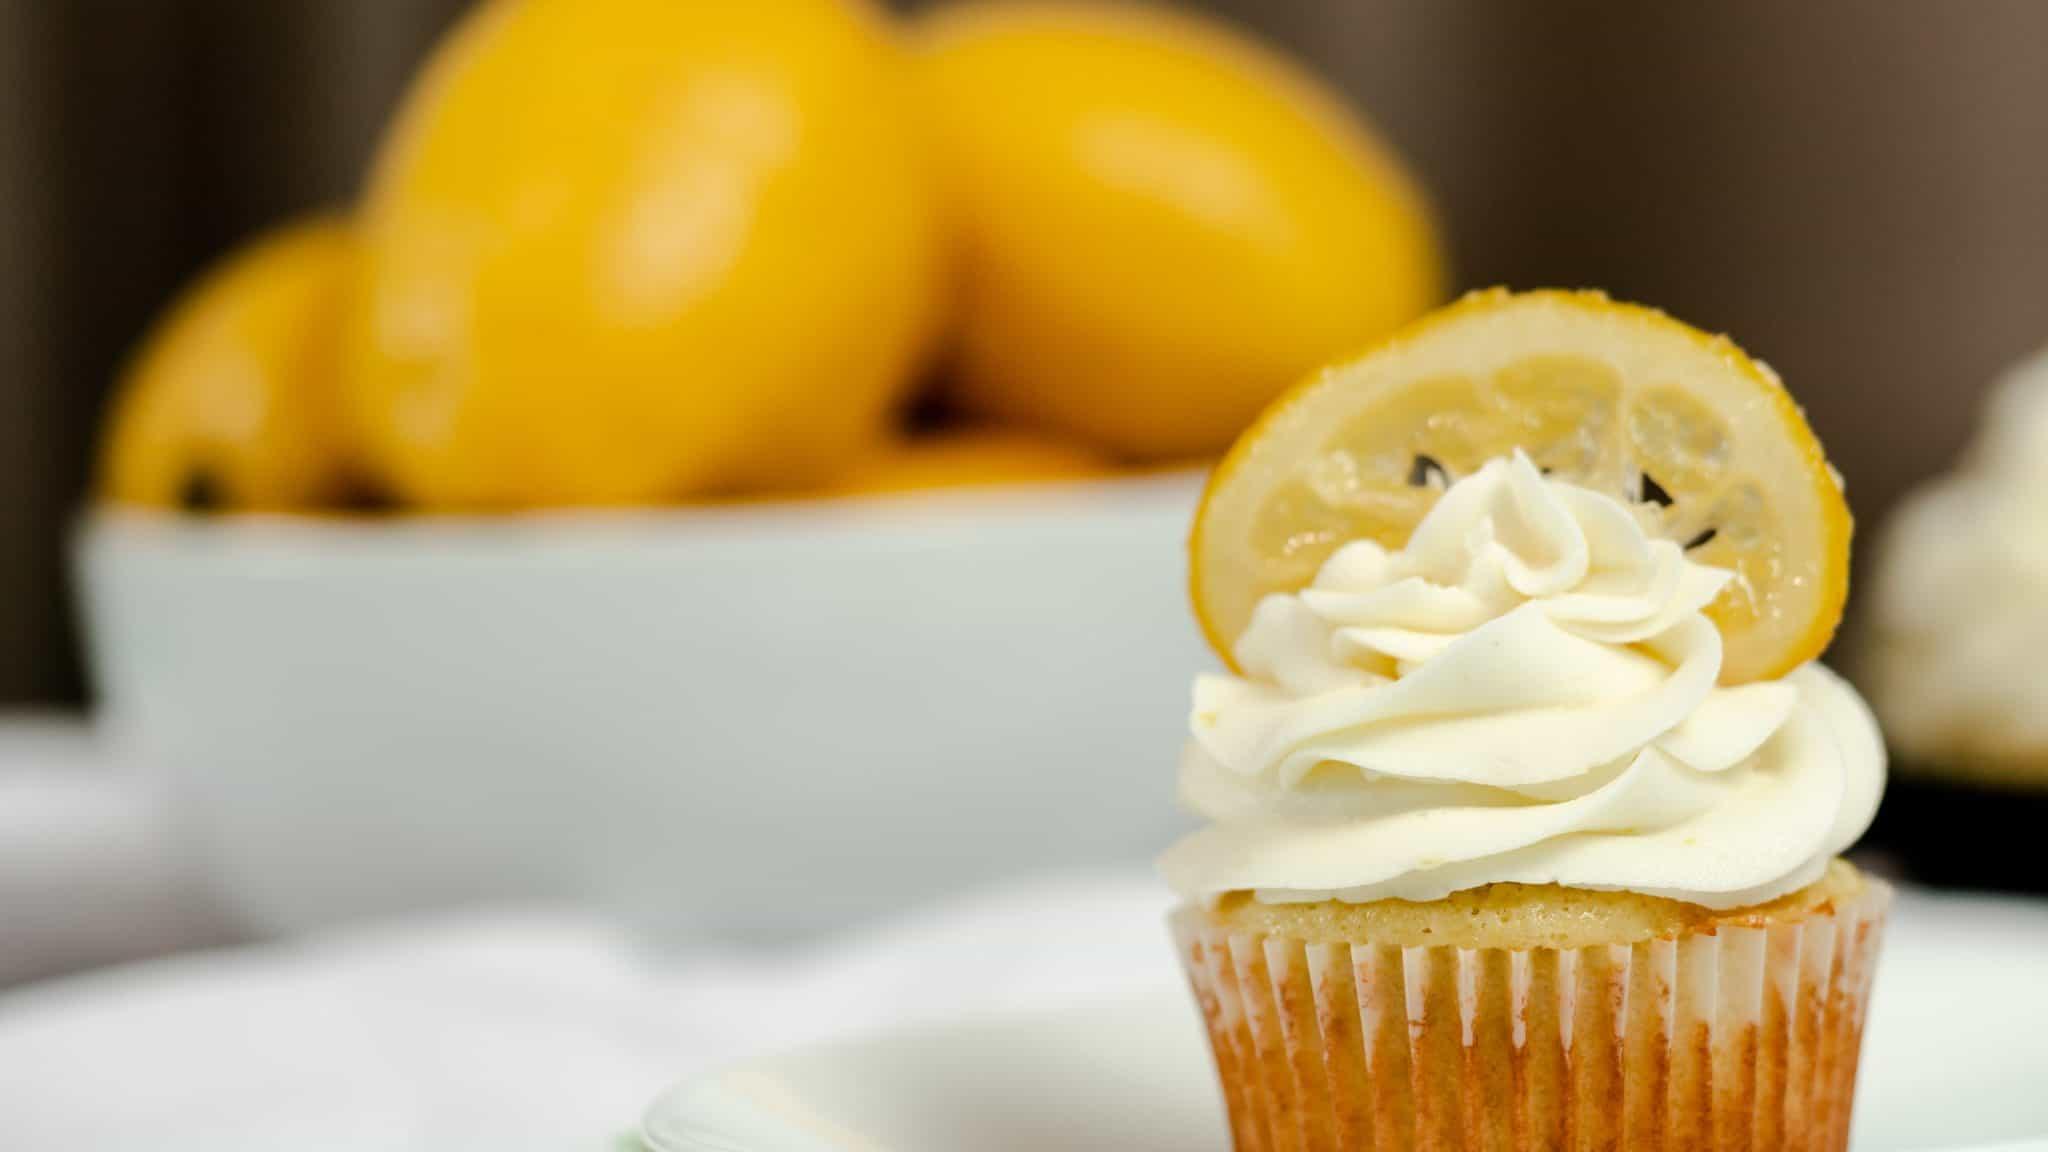 Lemon Vanilla Cupcake with a candied lemon on top.